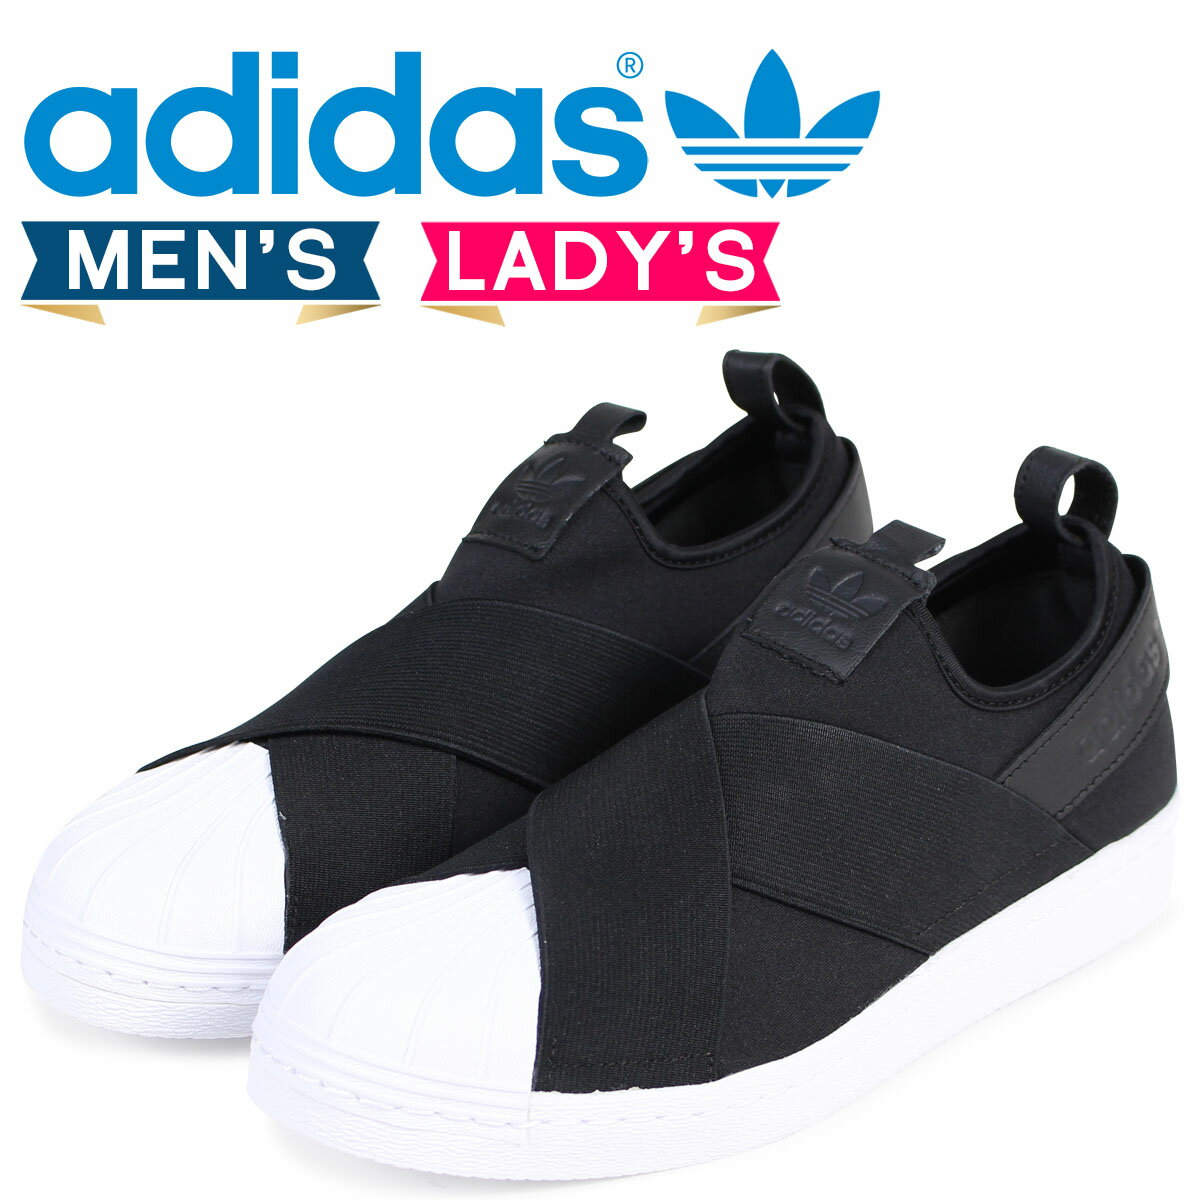 adidas Originals スーパースター アディダス スニーカー スリッポン SUPERSTAR SLIP-ON メンズ レディース BZ0112 ブラック オリジナルス [予約商品 3/2頃入荷予定 追加入荷]